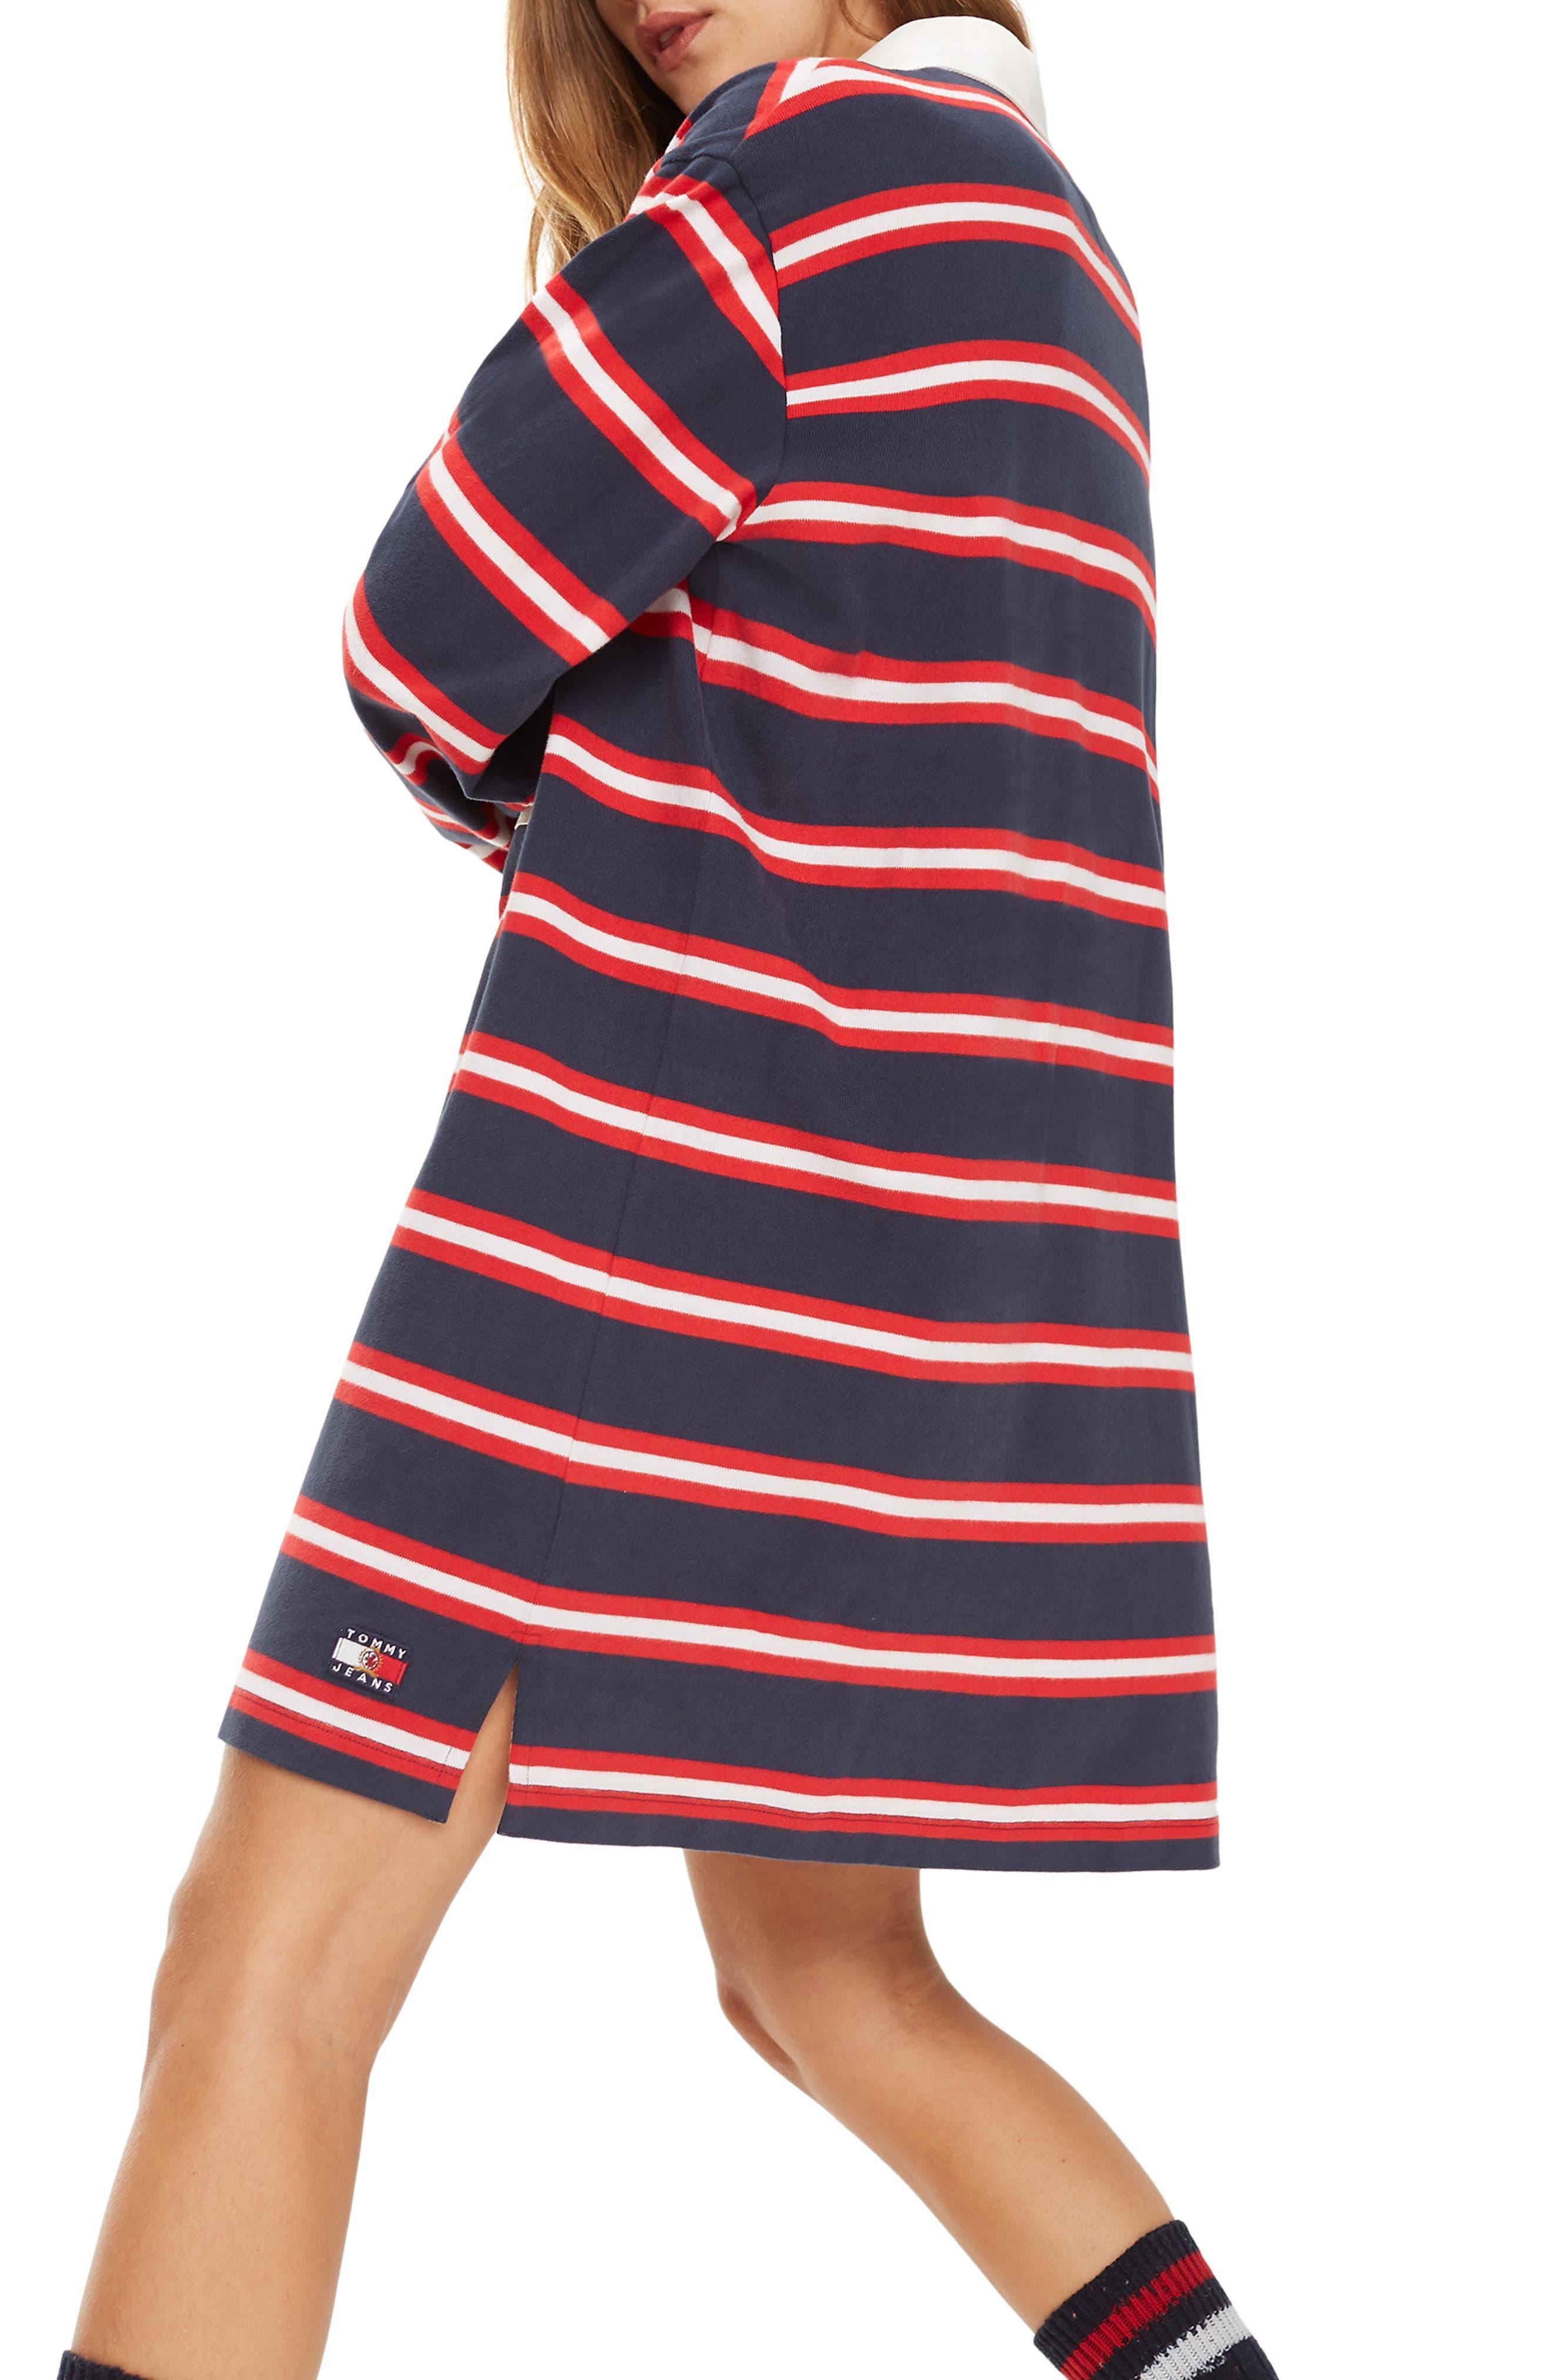 Crest Capsule Stripe Rugby Dress,                             Alternate thumbnail 2, color,                             DARK SAPPHIRE / MULTI